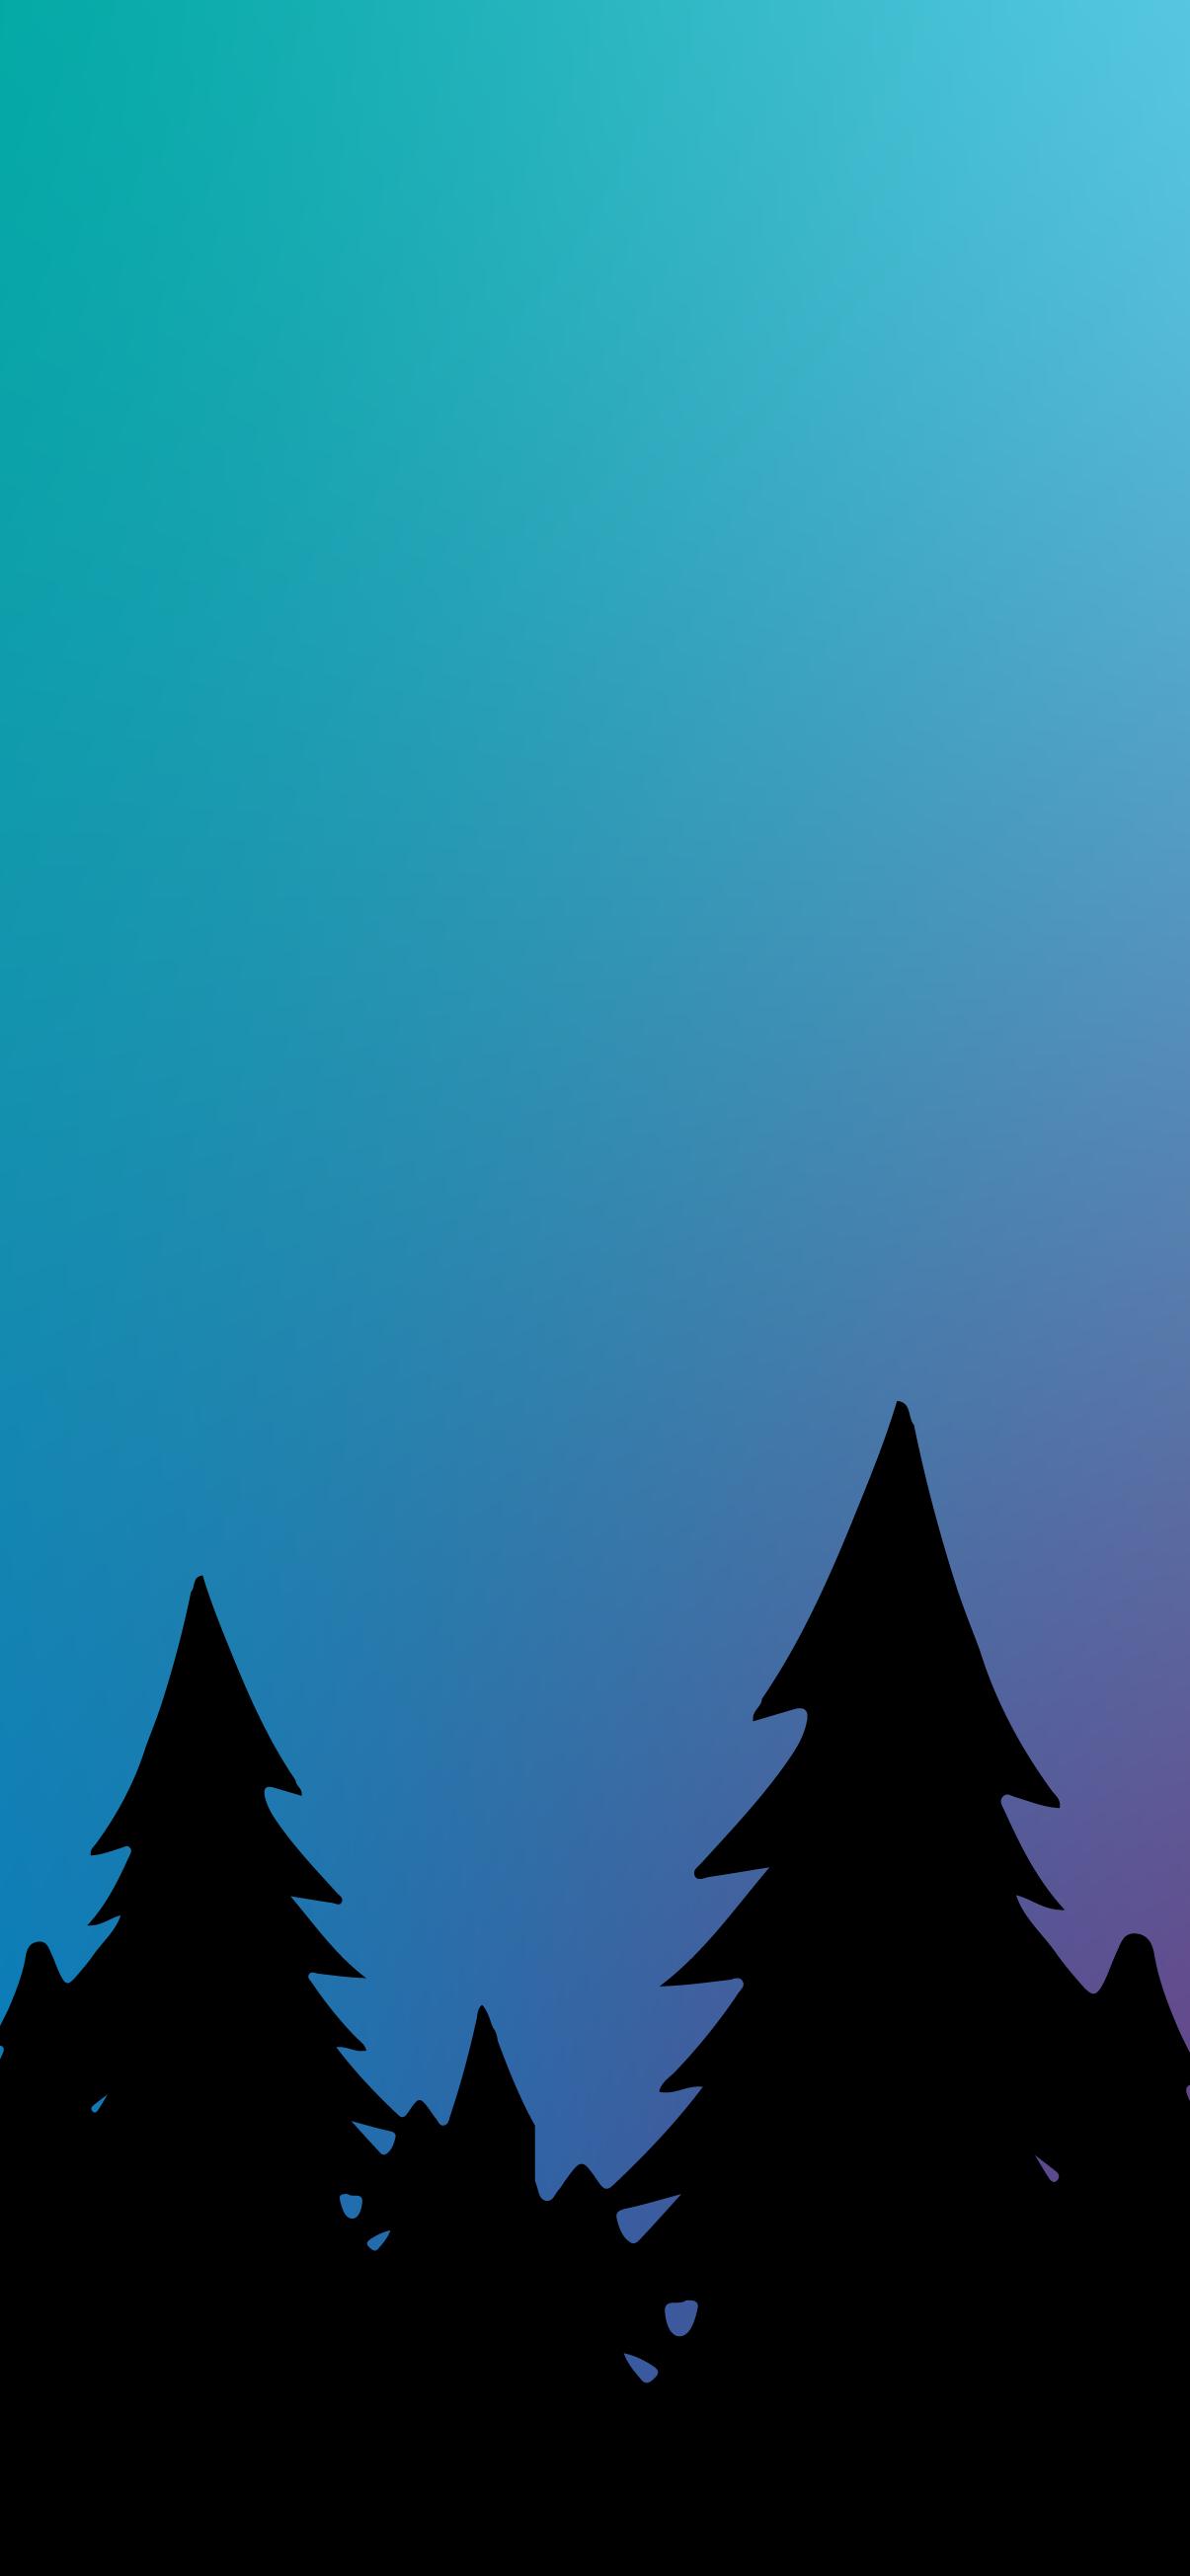 forest background wallpaper 4k